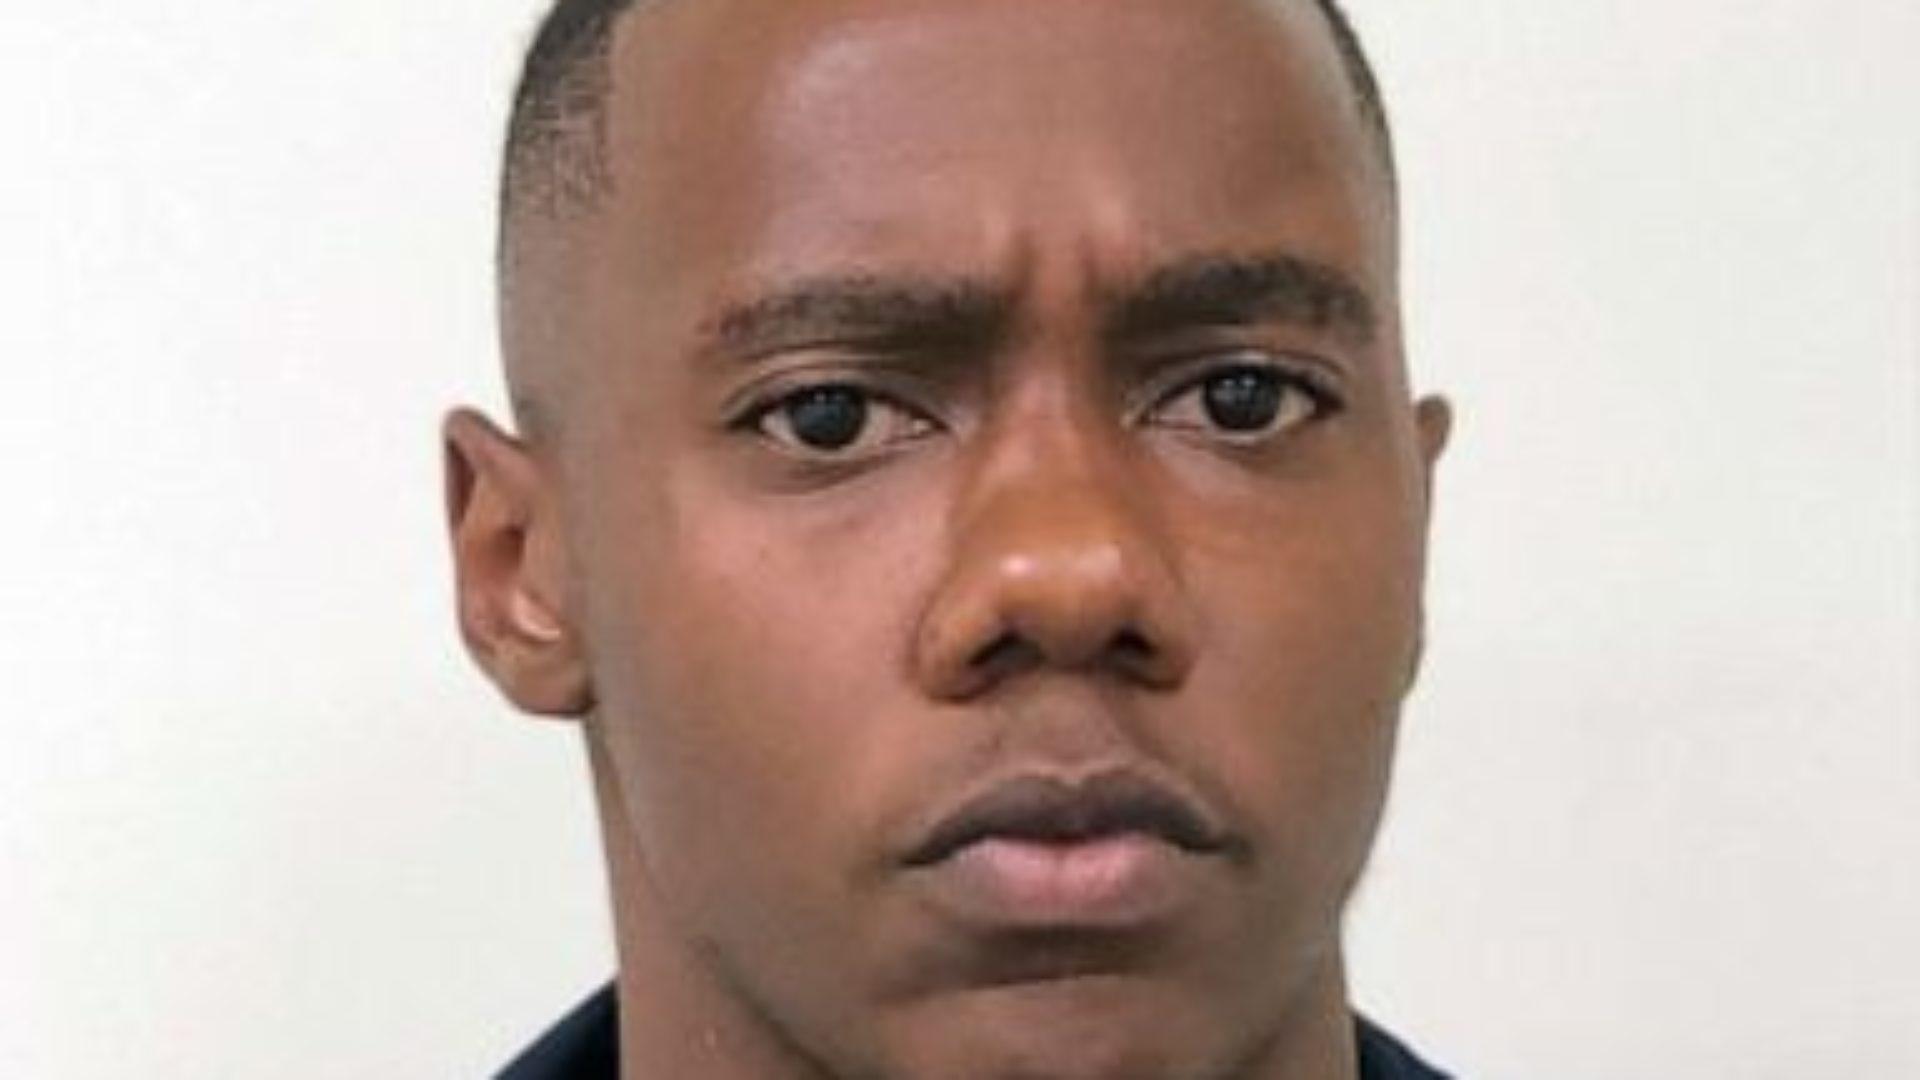 Alleged Serial Rapist Identified As Former Police Recruit